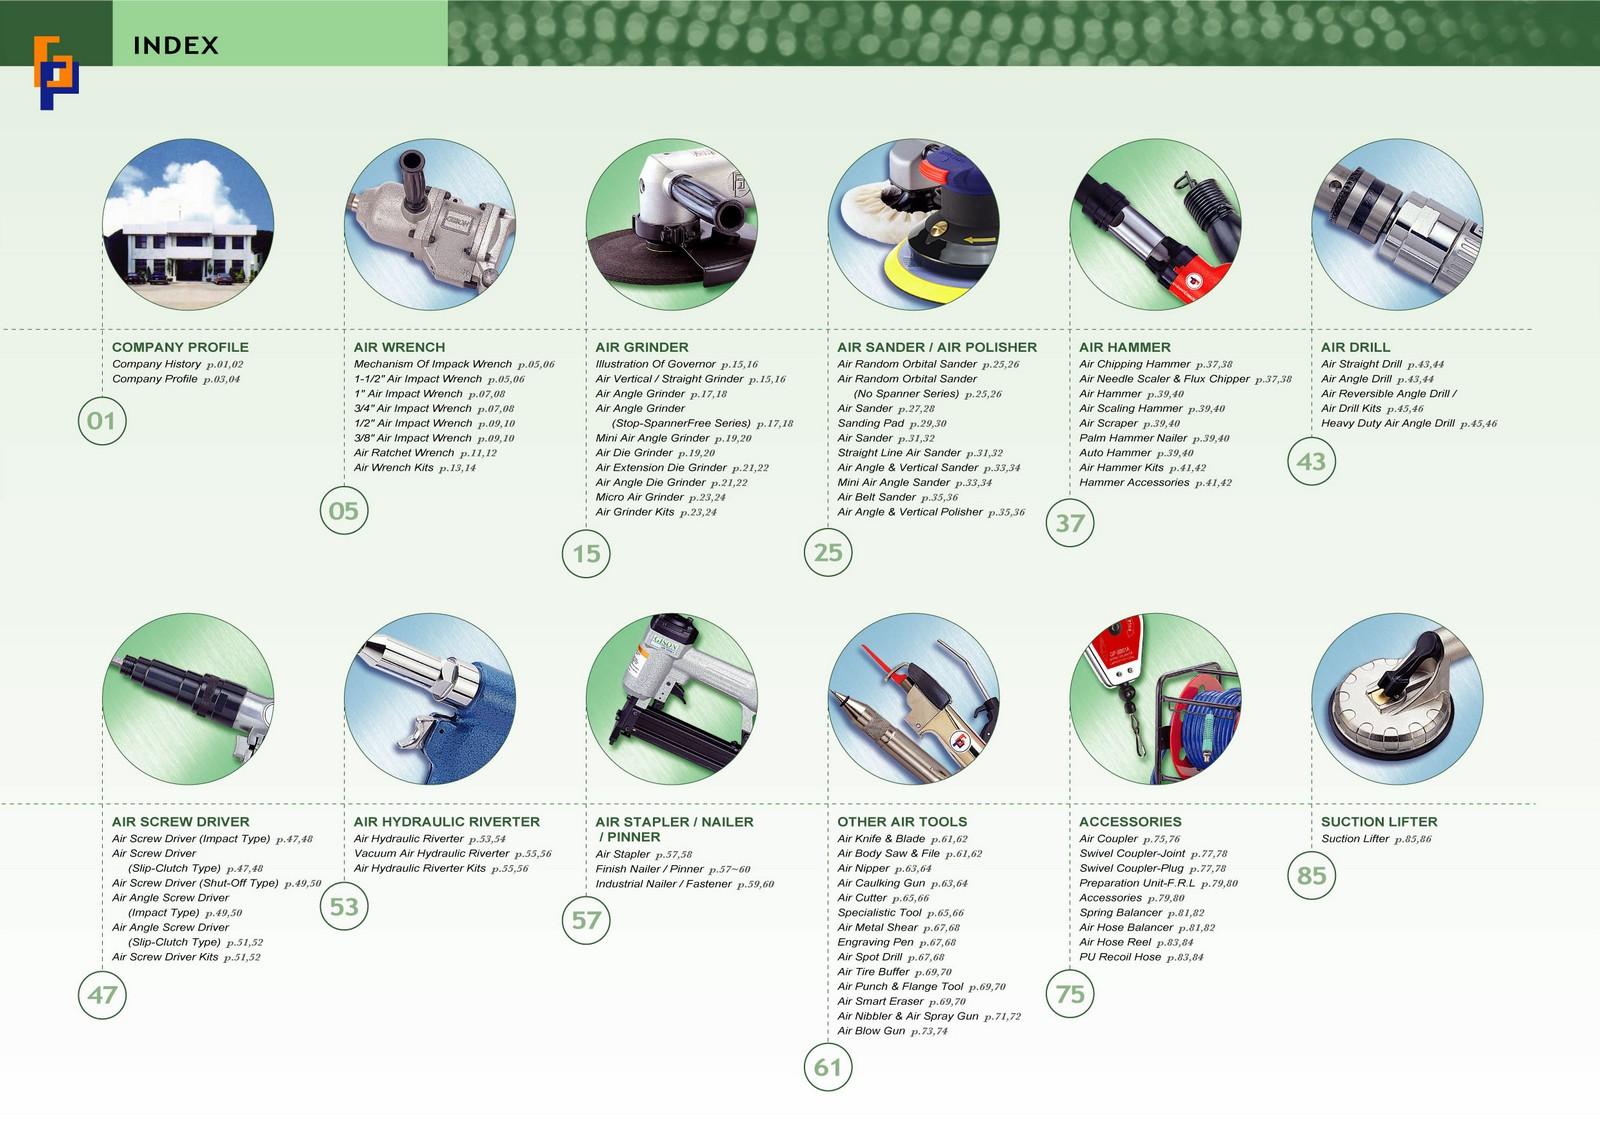 2007-2008 GISON Air Tools, Pneumatic Tools Catalog | GISON MACHINERY